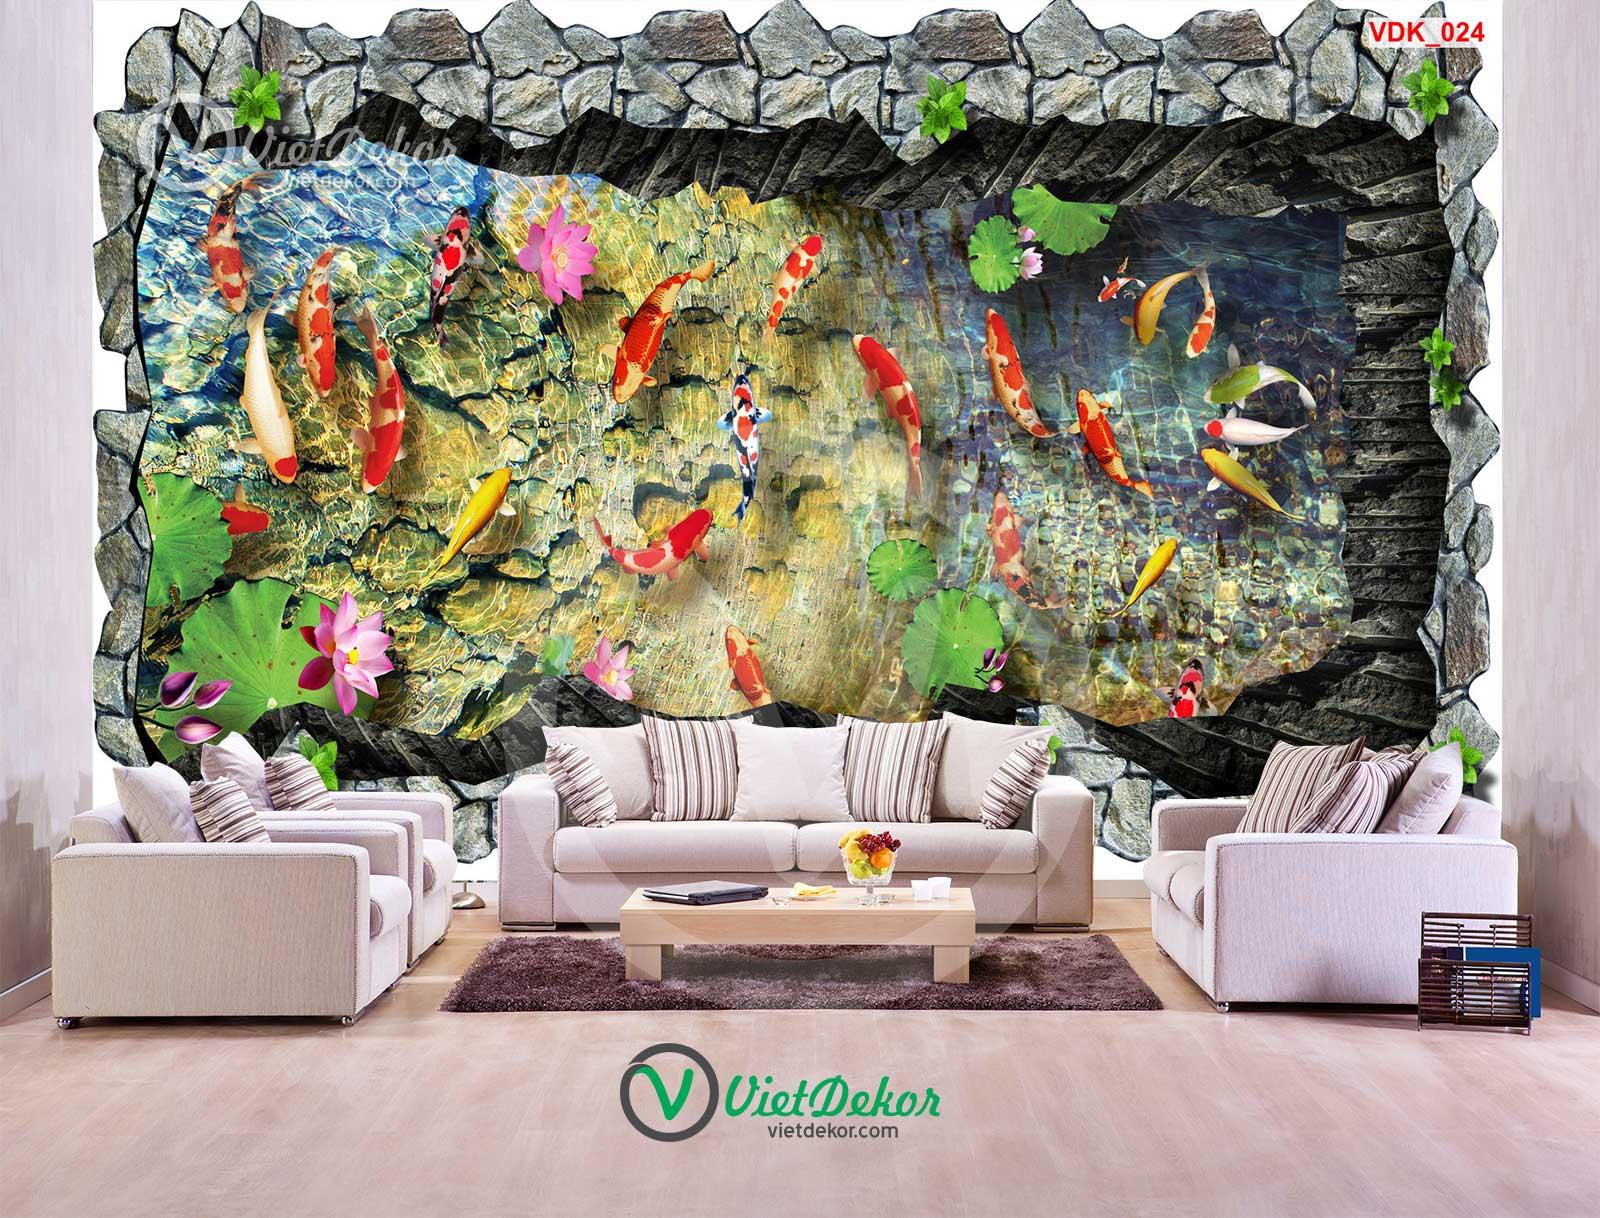 Tranh dán tường 3d bầy cá hoa sen